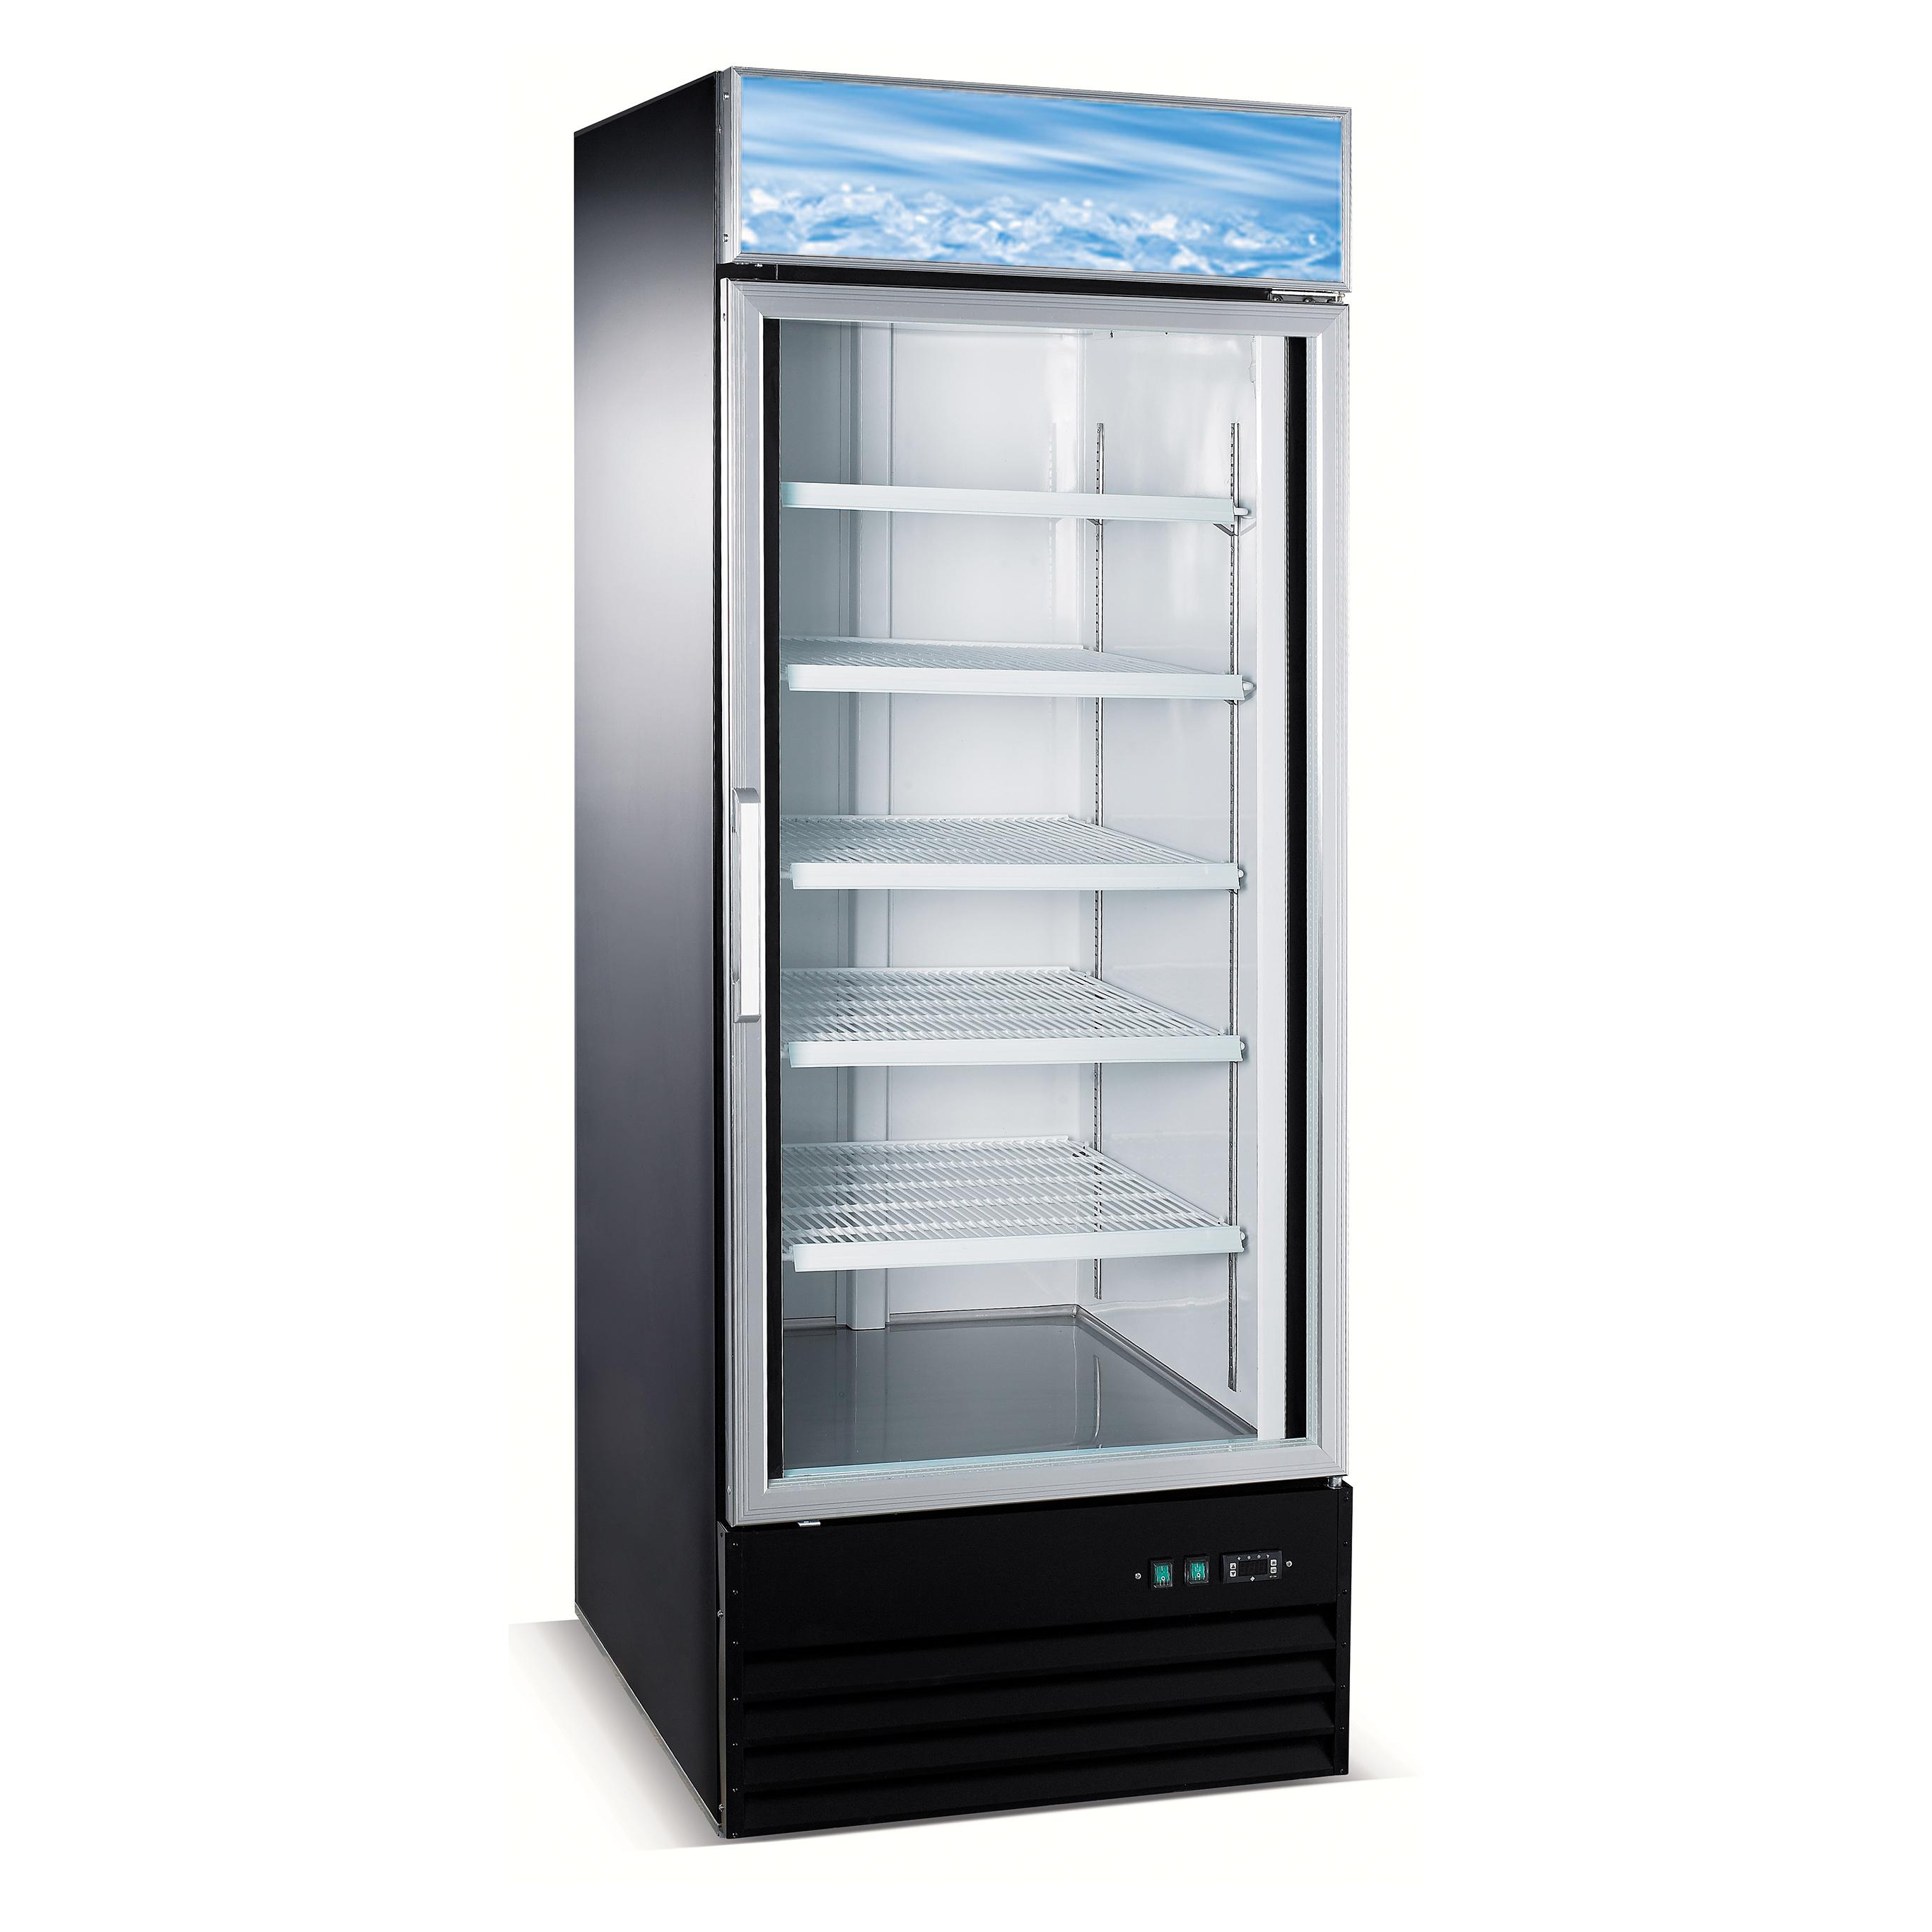 Kelvinator Commercial KCGM24FB-HC freezer, merchandiser